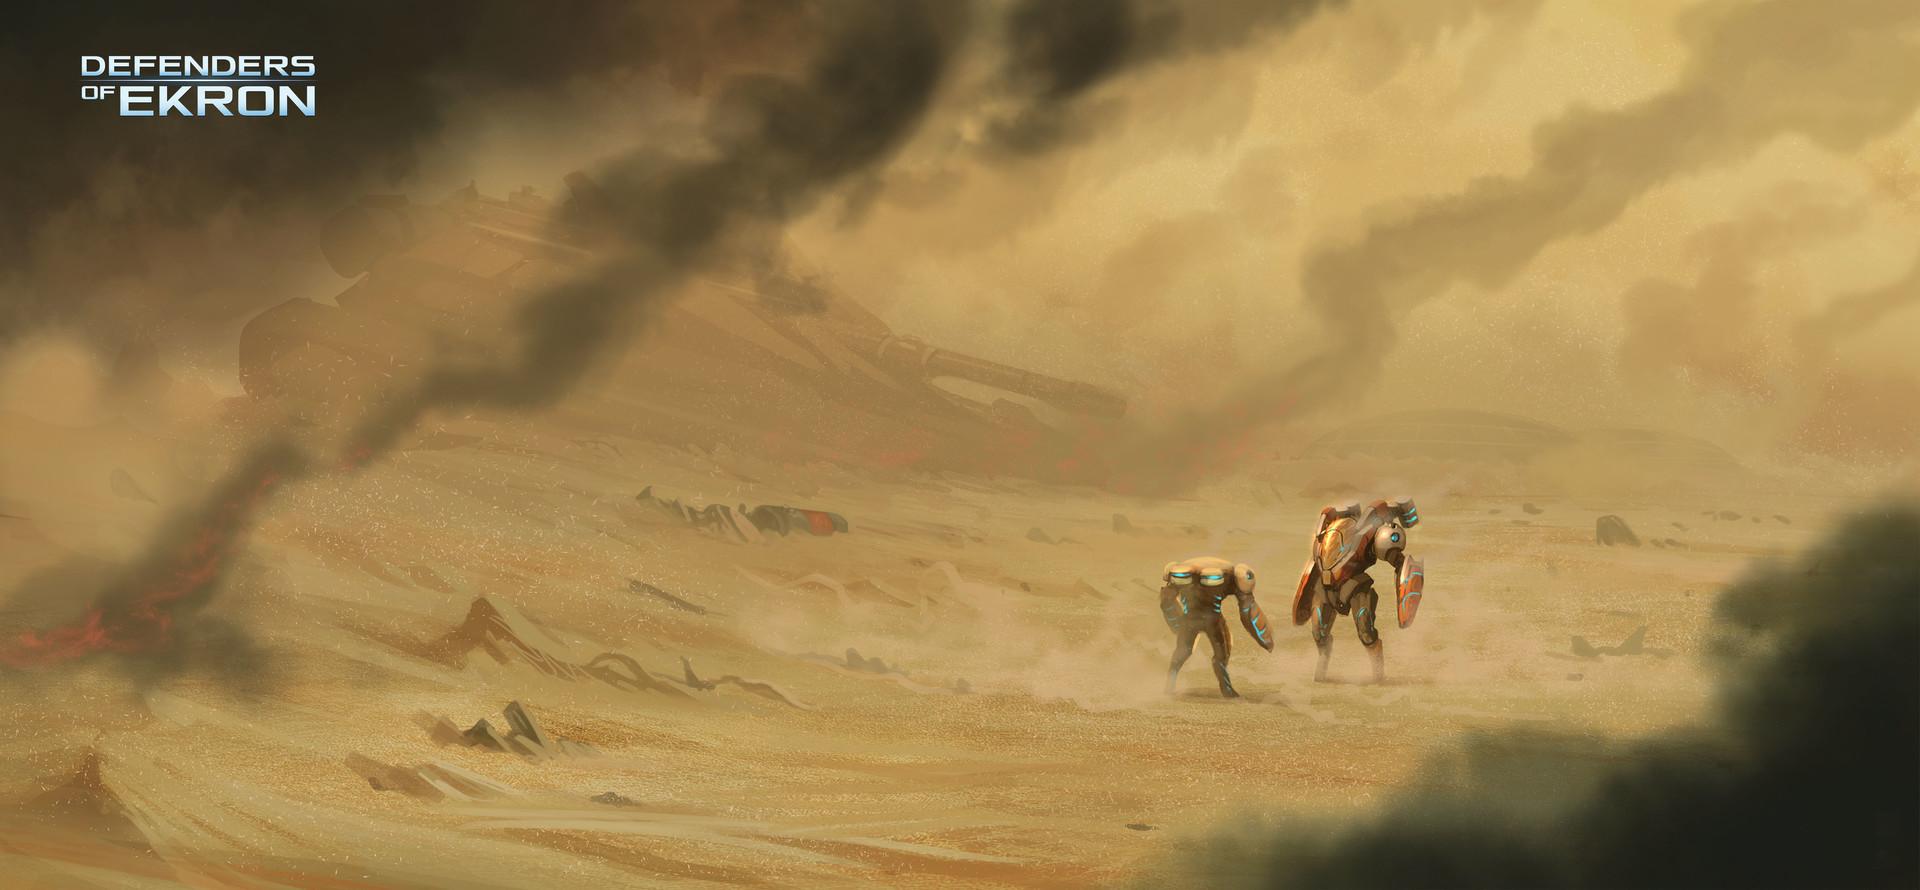 Francisco badilla khara desert